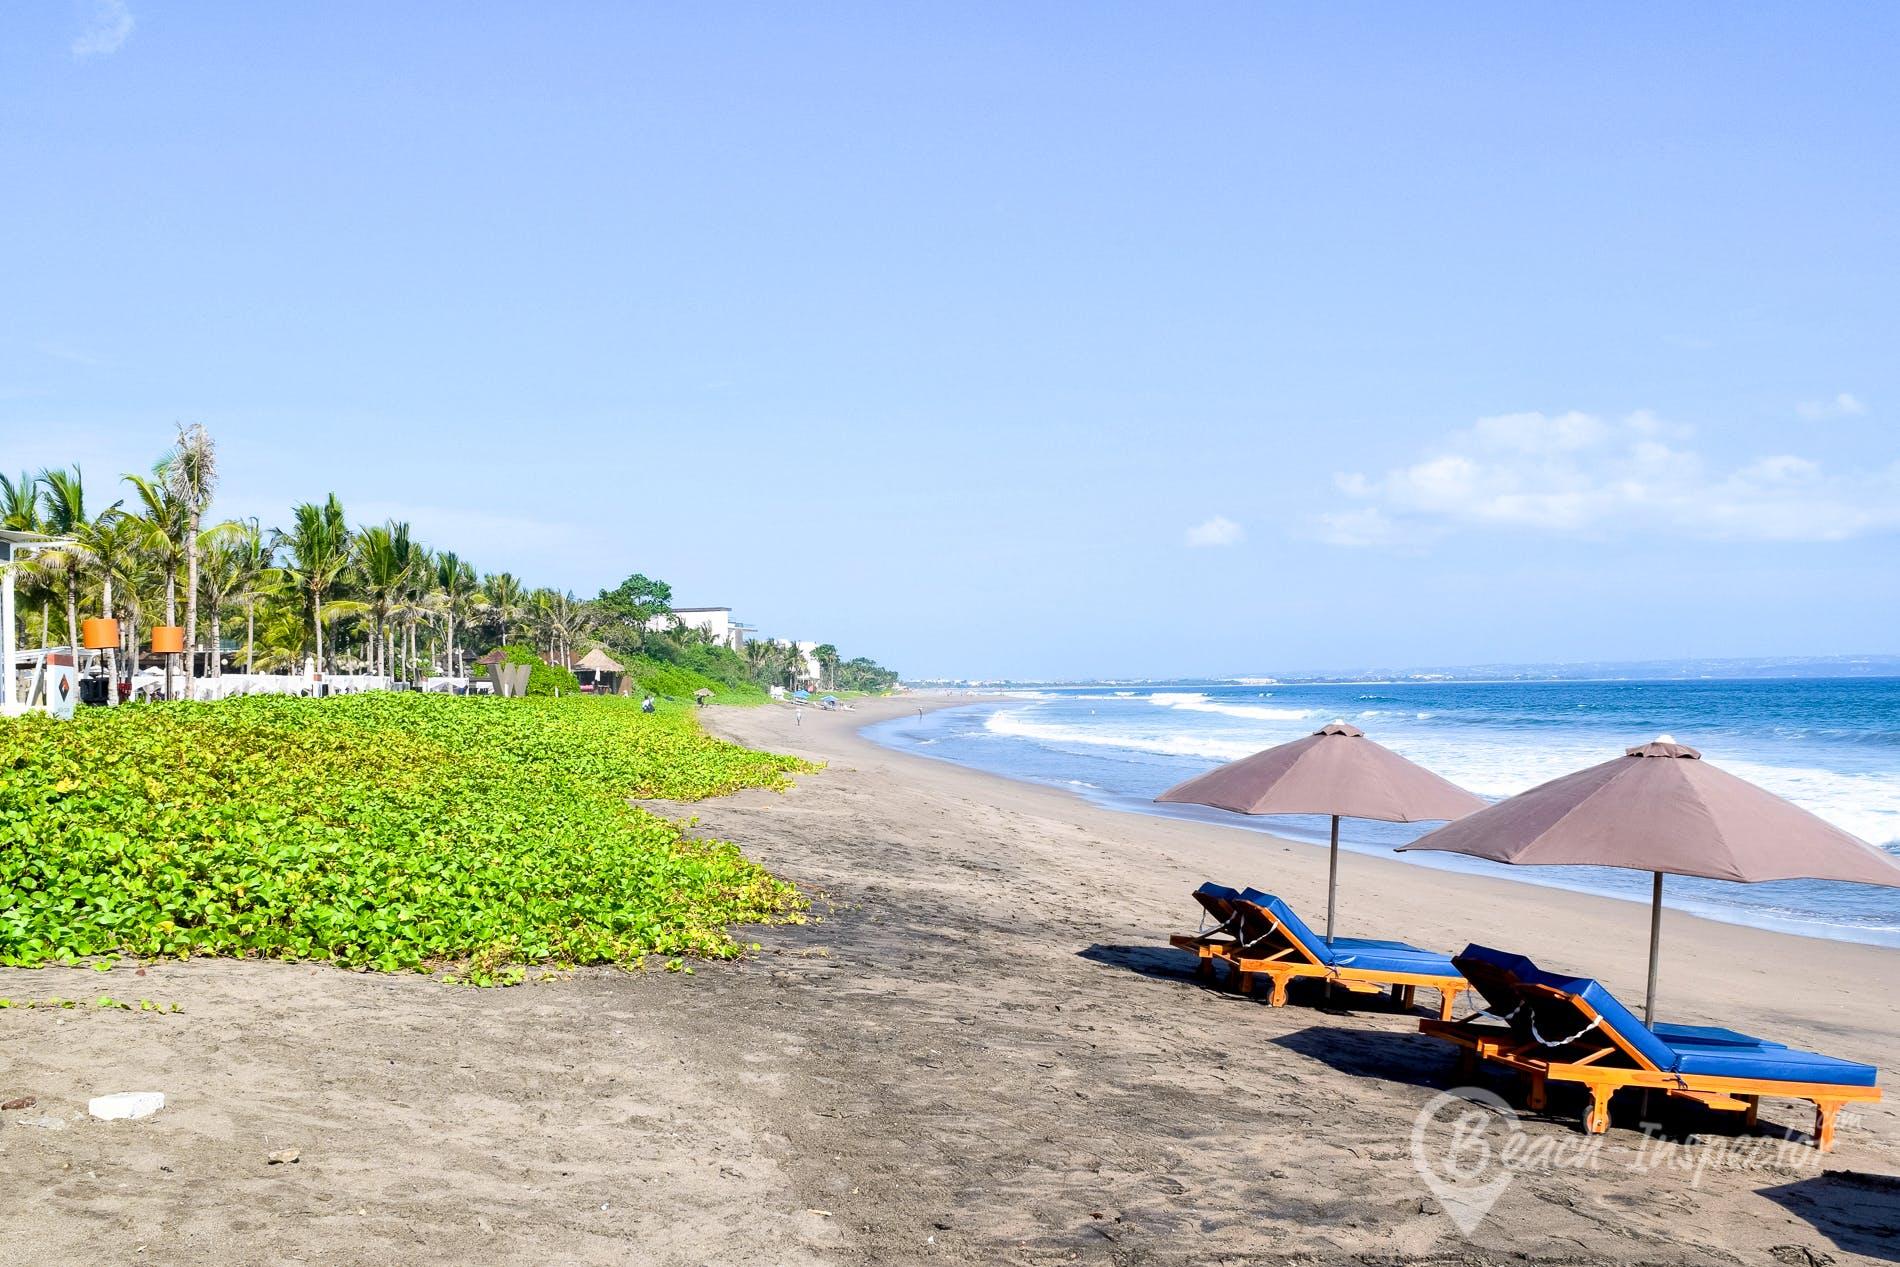 Playa Batu Belig Beach, Bali, Indonesia